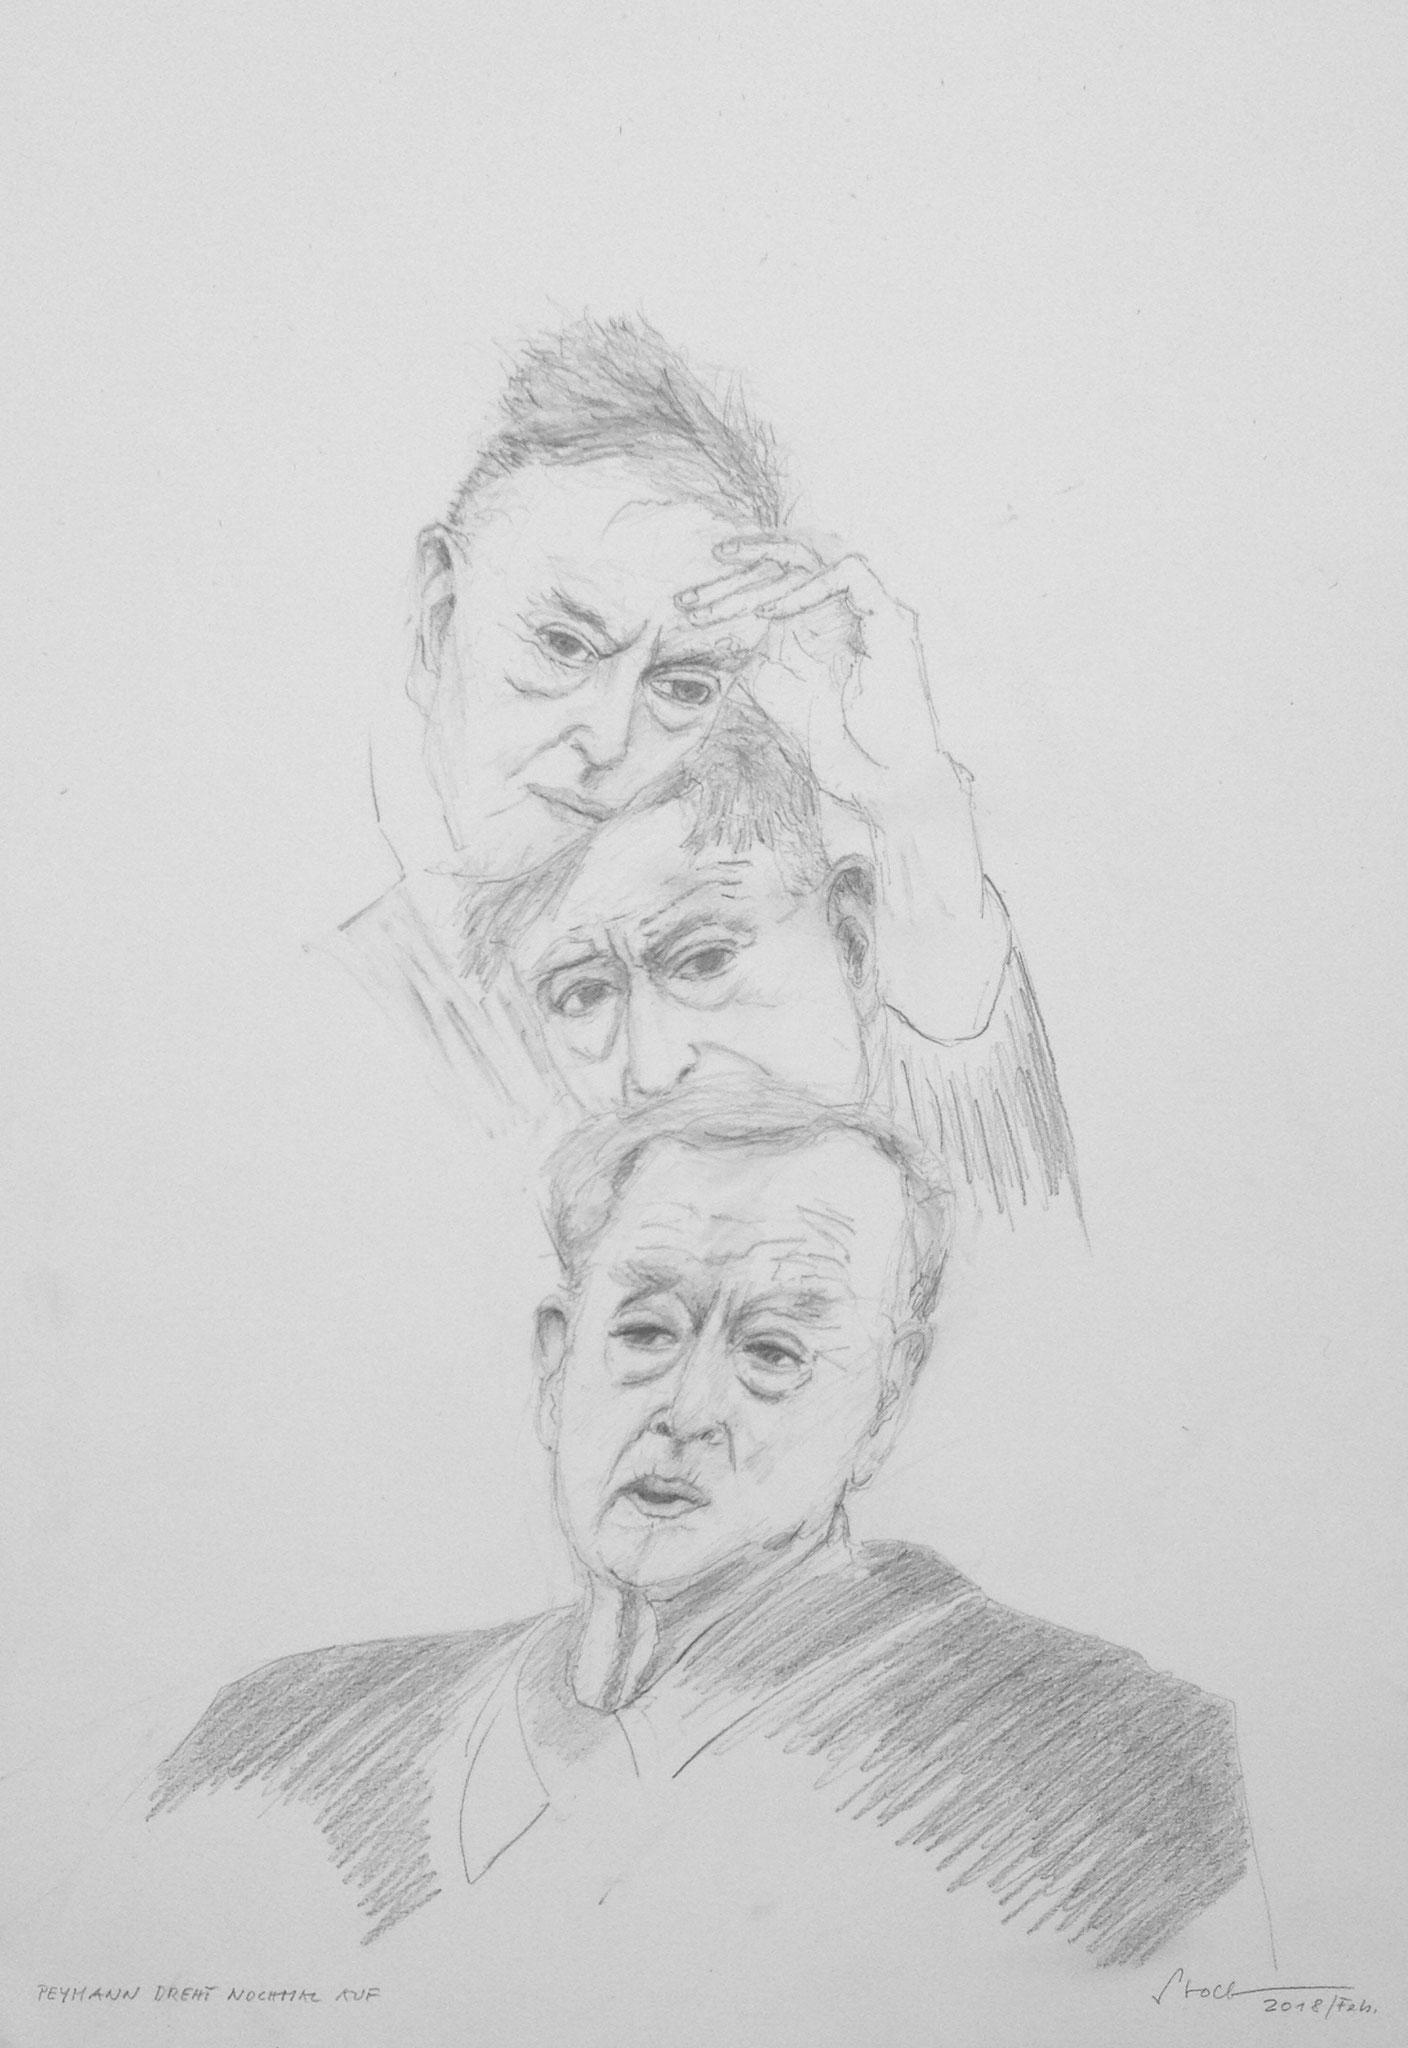 """Peymann dreht nochmal auf II"", 2018, Zeichnung, 40 x 30 cm (#841)"